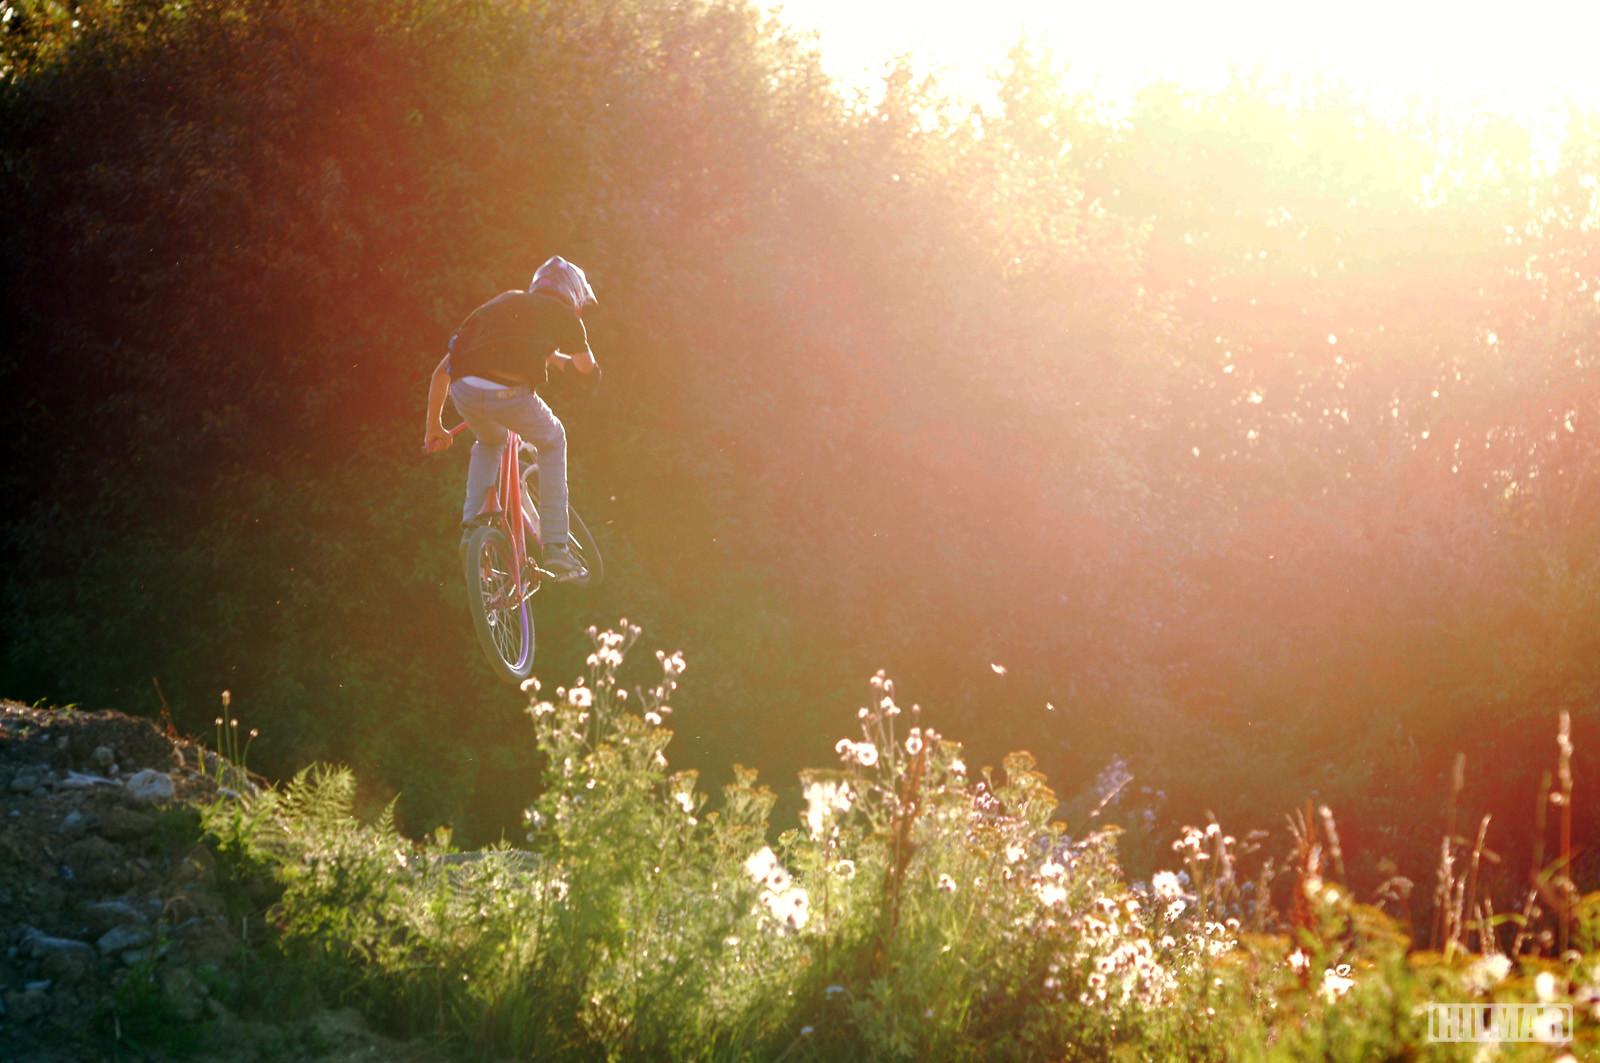 Sunset sesh - Fredleth - Mountain Biking Pictures - Vital MTB